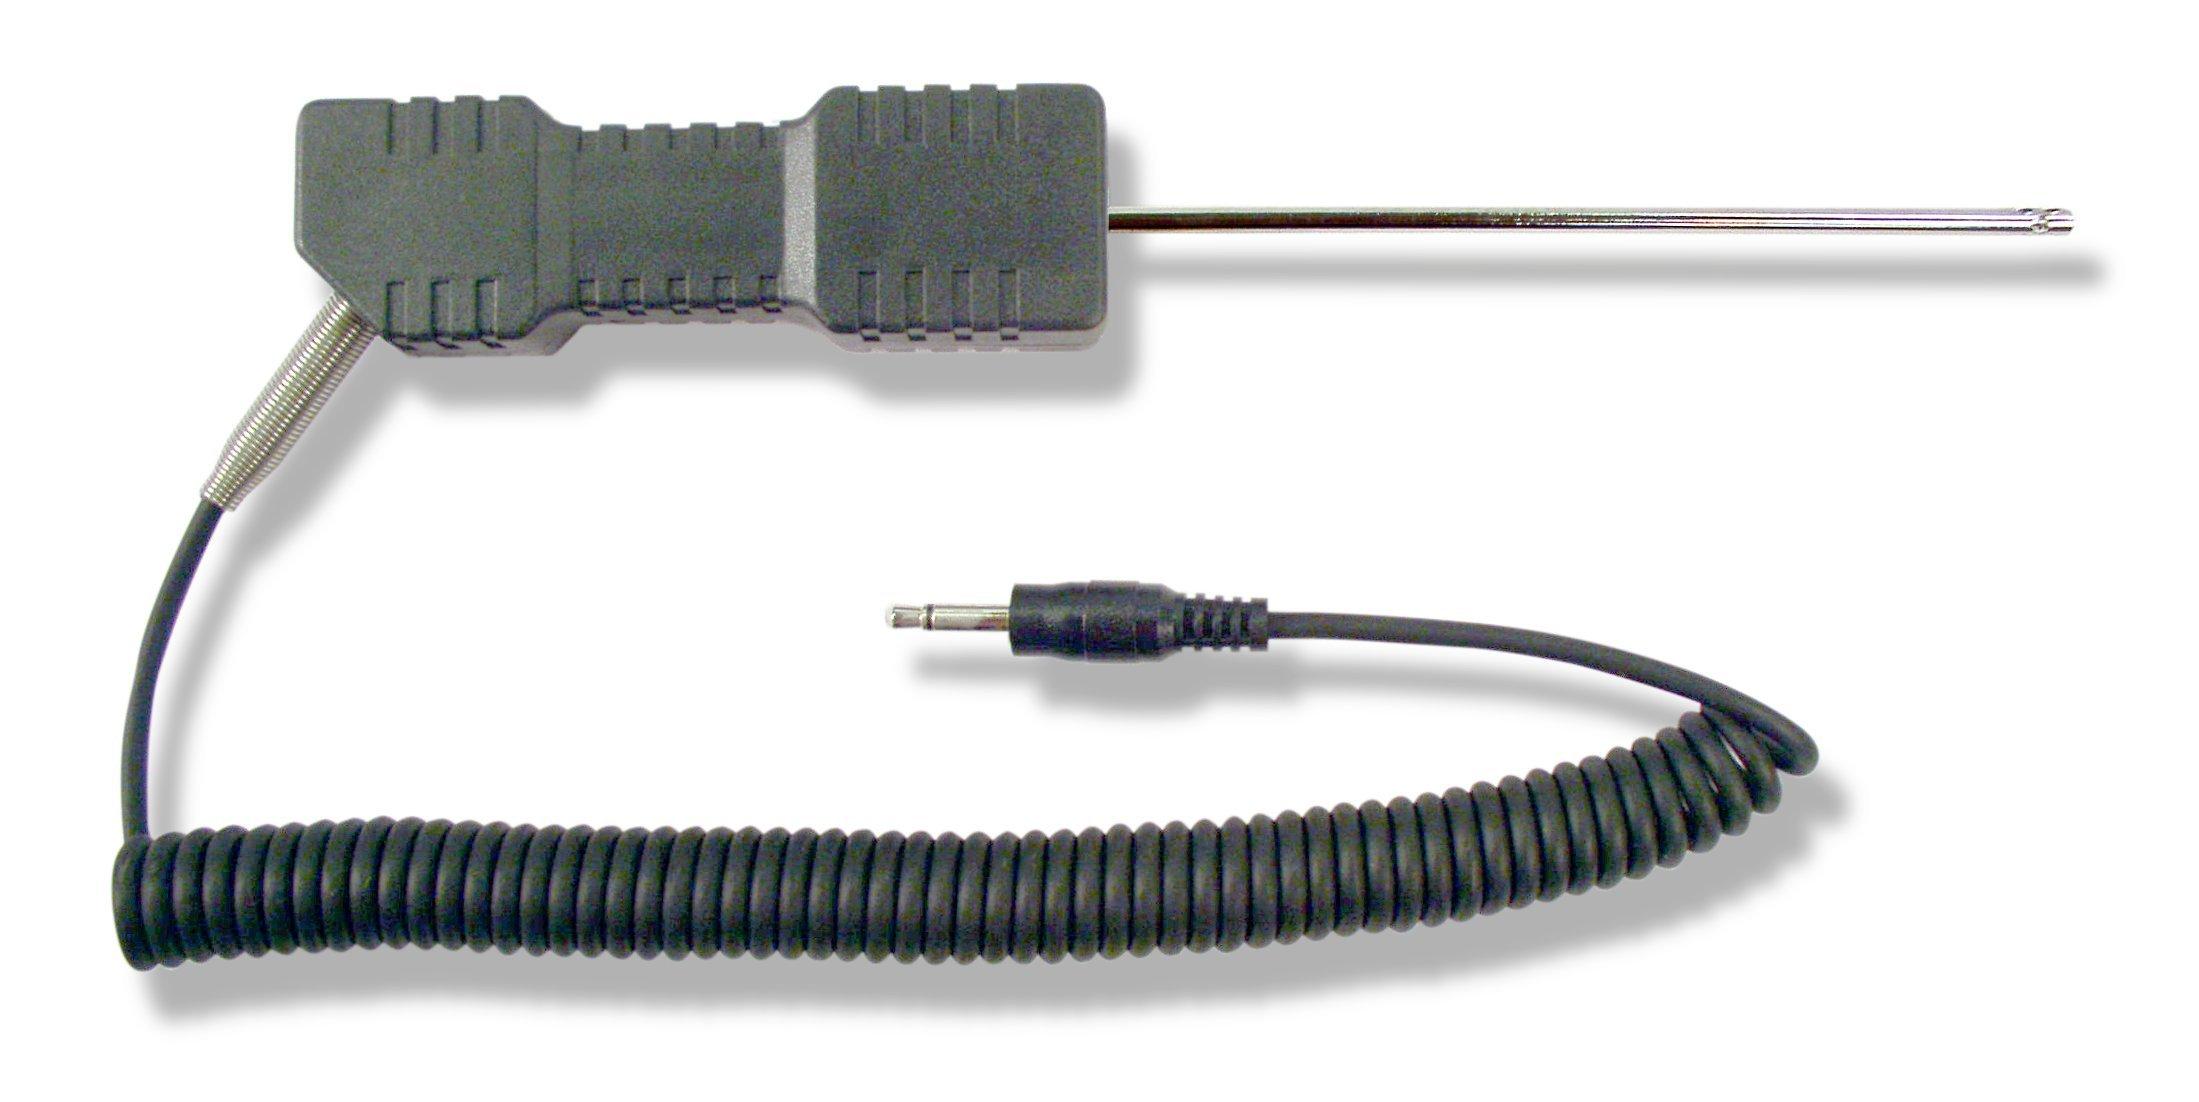 Cooper-Atkins 5005 Air Thermistor Probe, 4'' Shaft Length